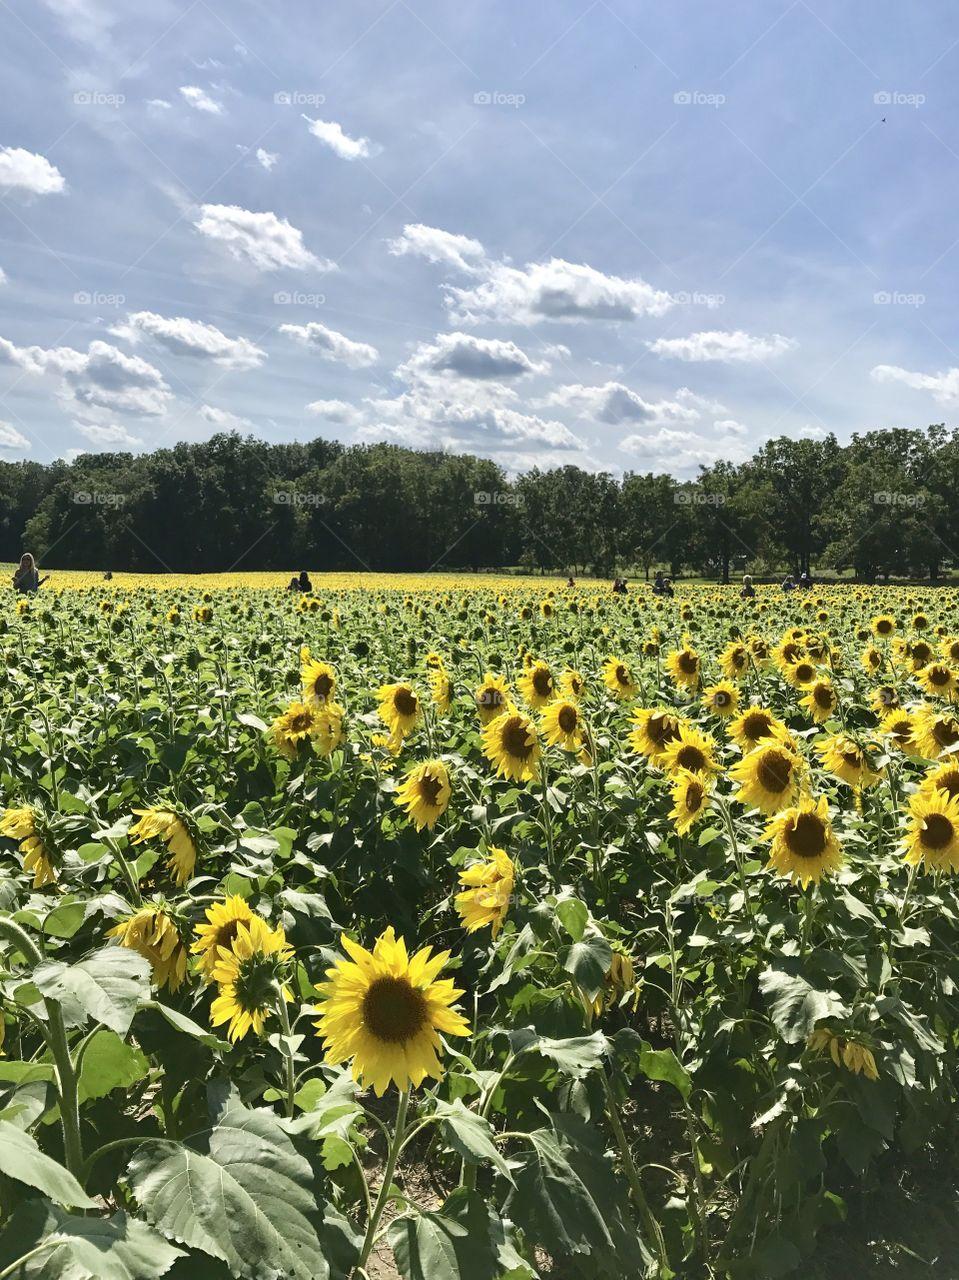 Tecumsah Land Trust in yellow springs Ohio  2017 sunflower field in full bloom 🌻